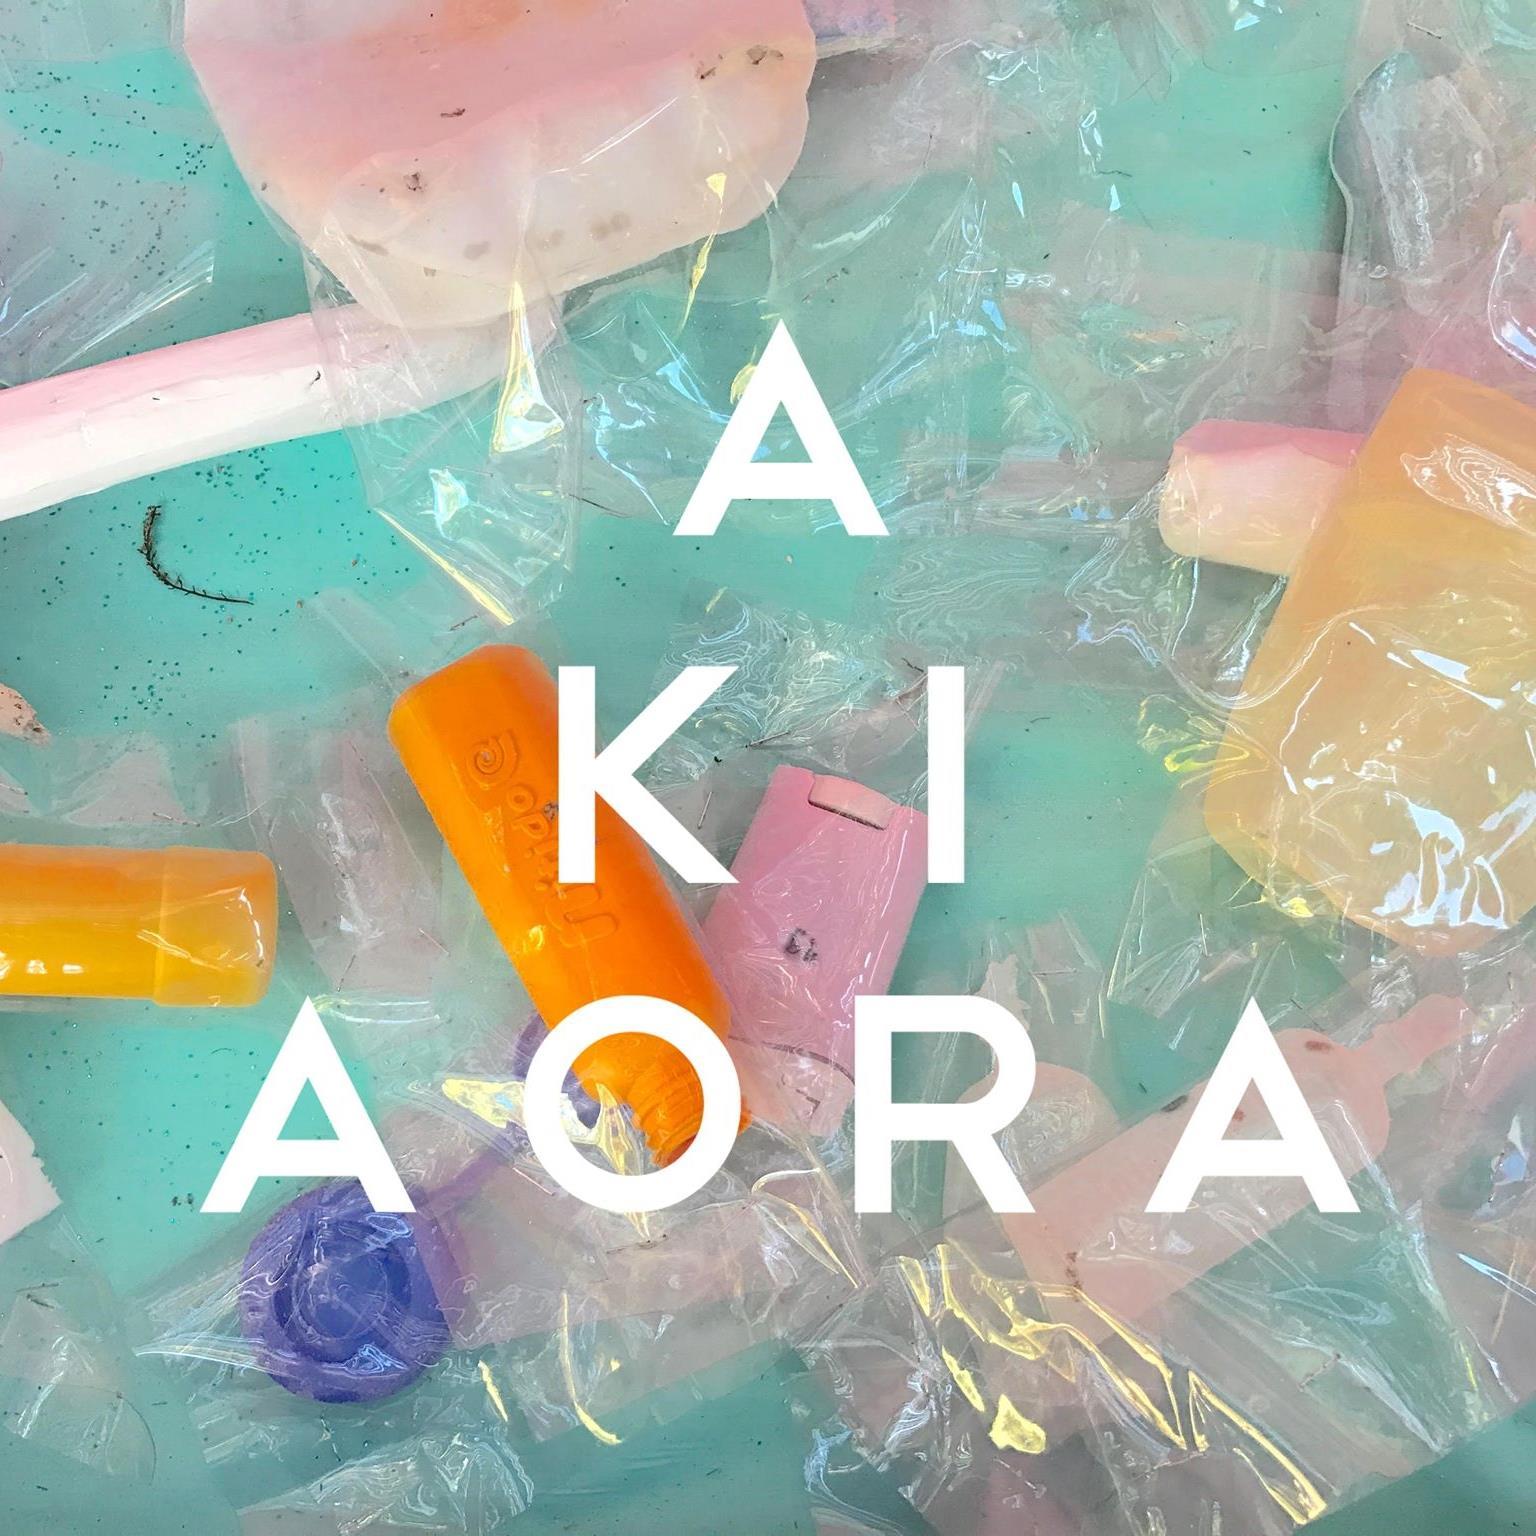 akiaora2017portada 2.jpg